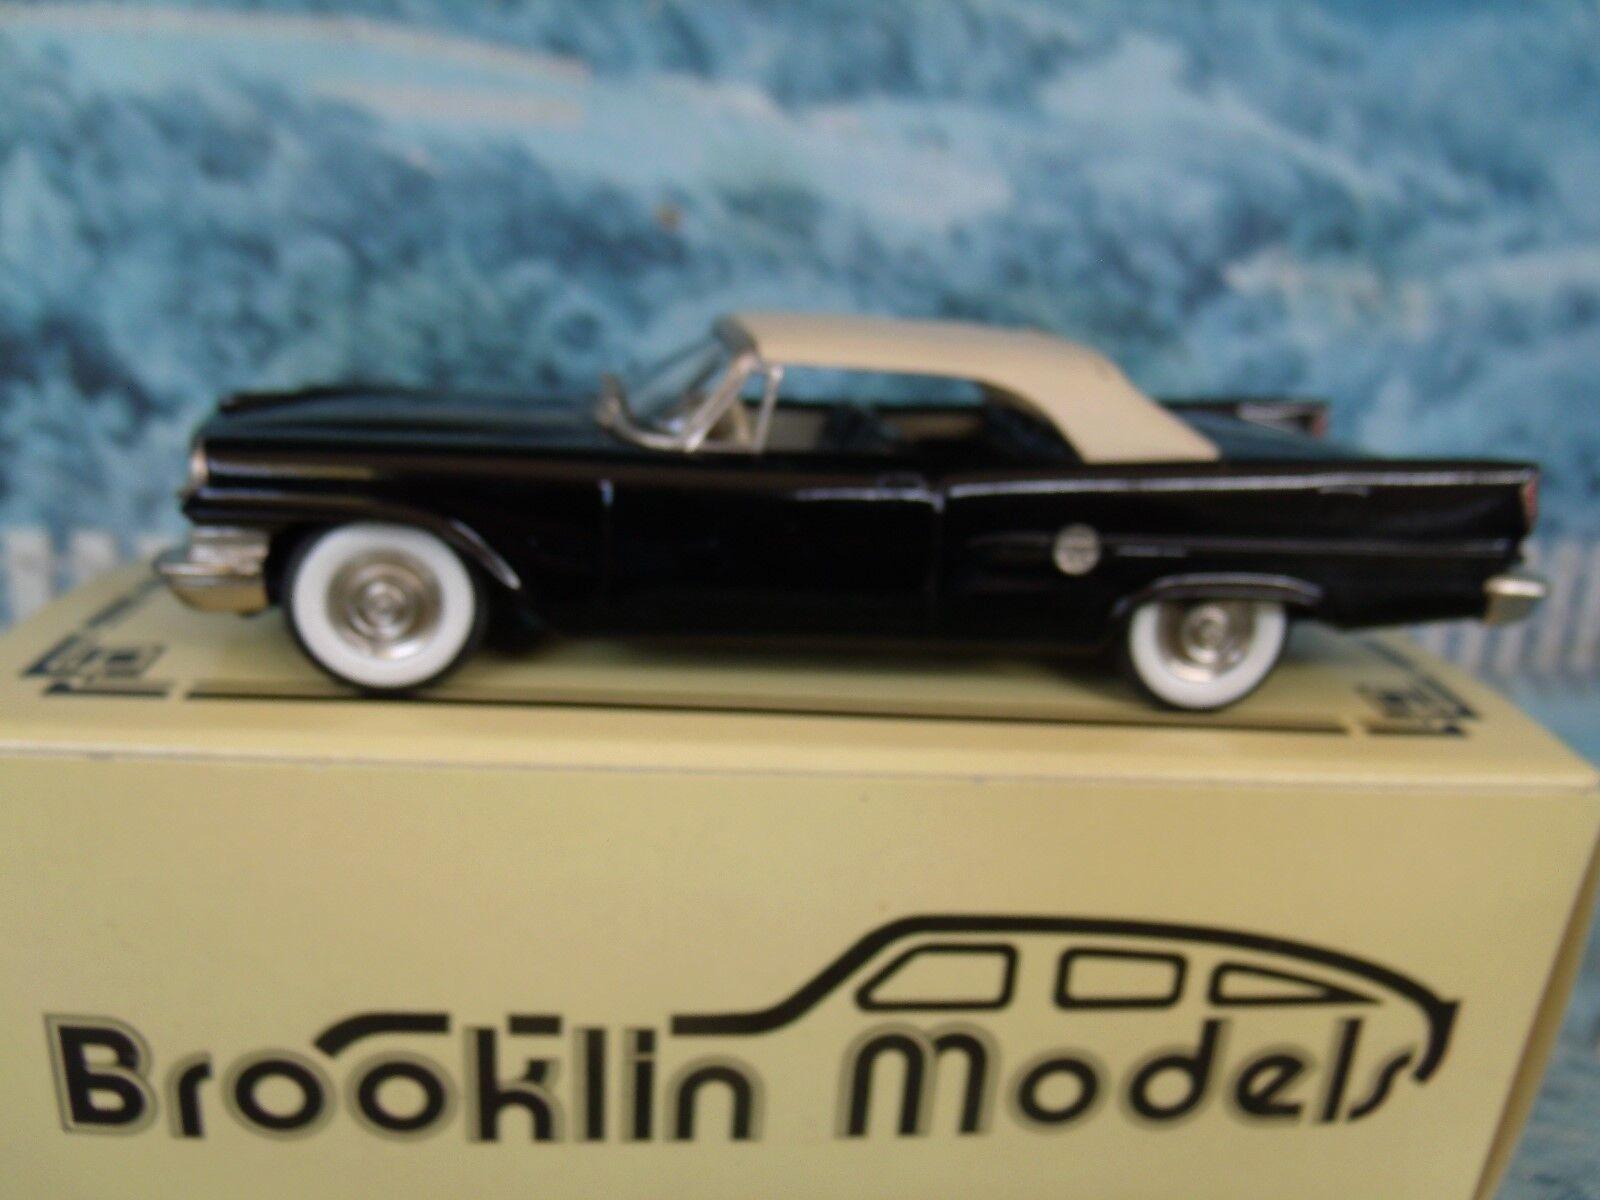 1  43 Brooklin models  BRK.41x 1959 Chrysler 300E  boutique en ligne